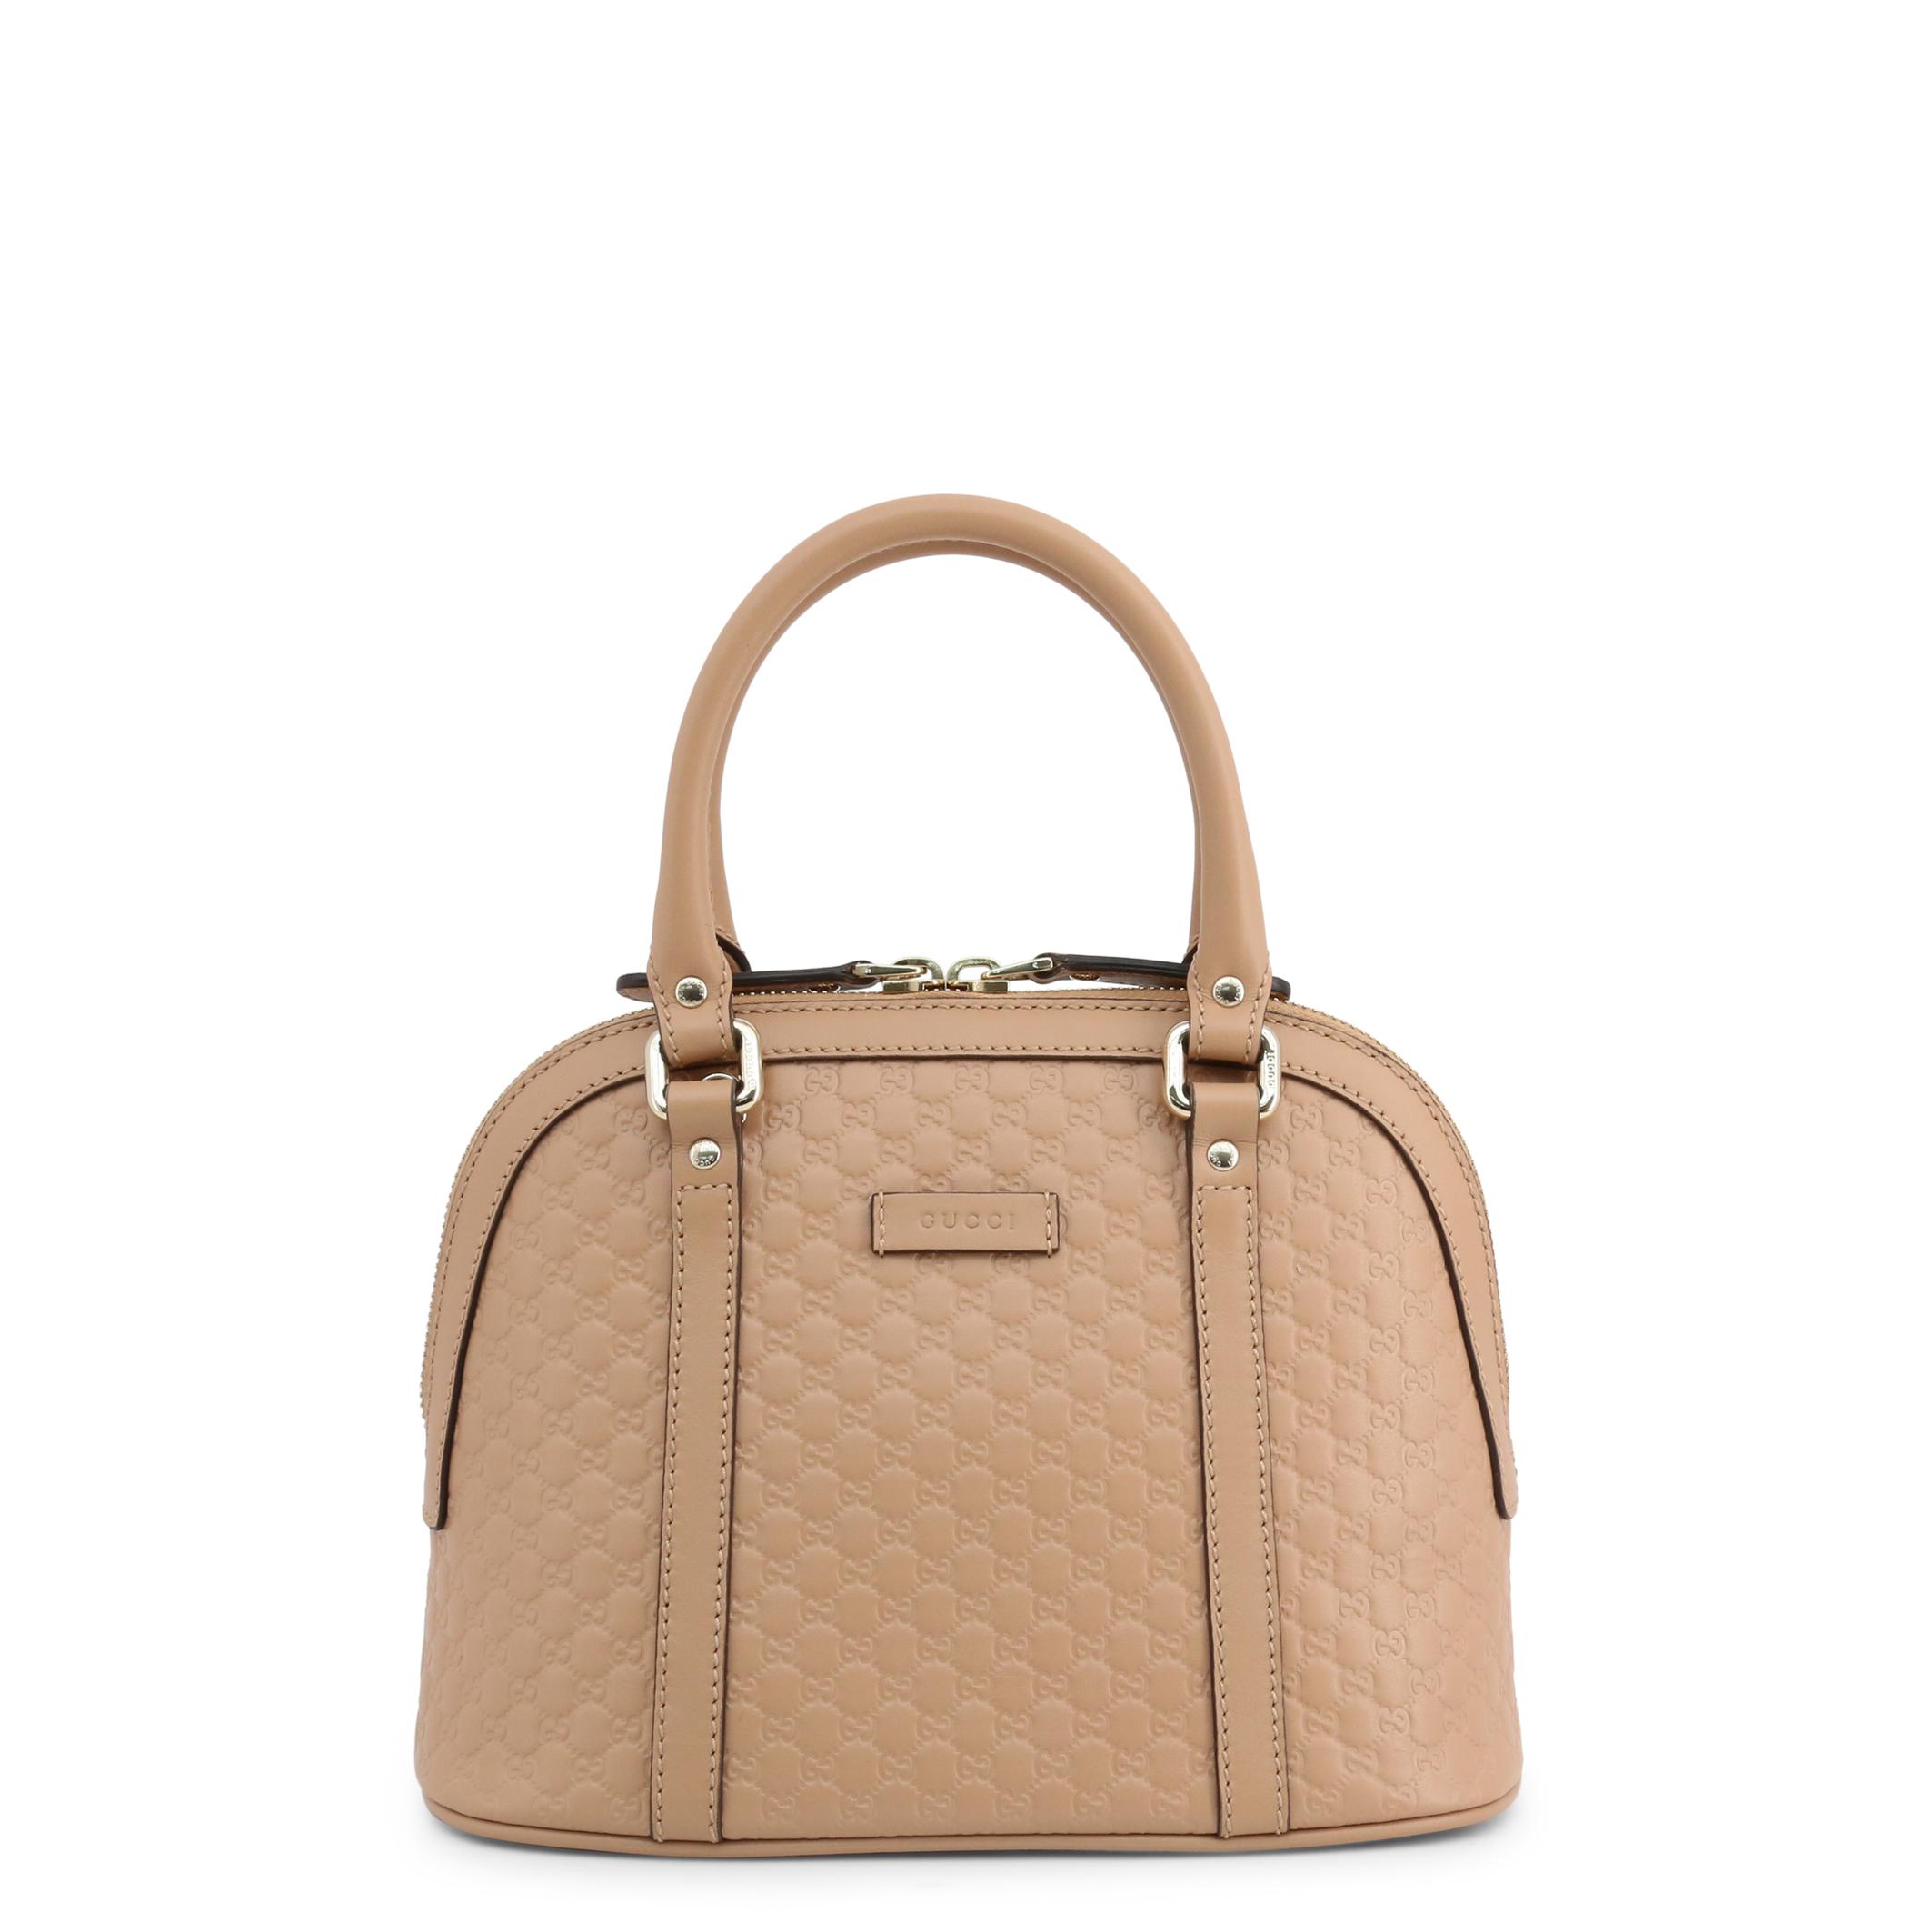 Gucci 449654 BMJ1G